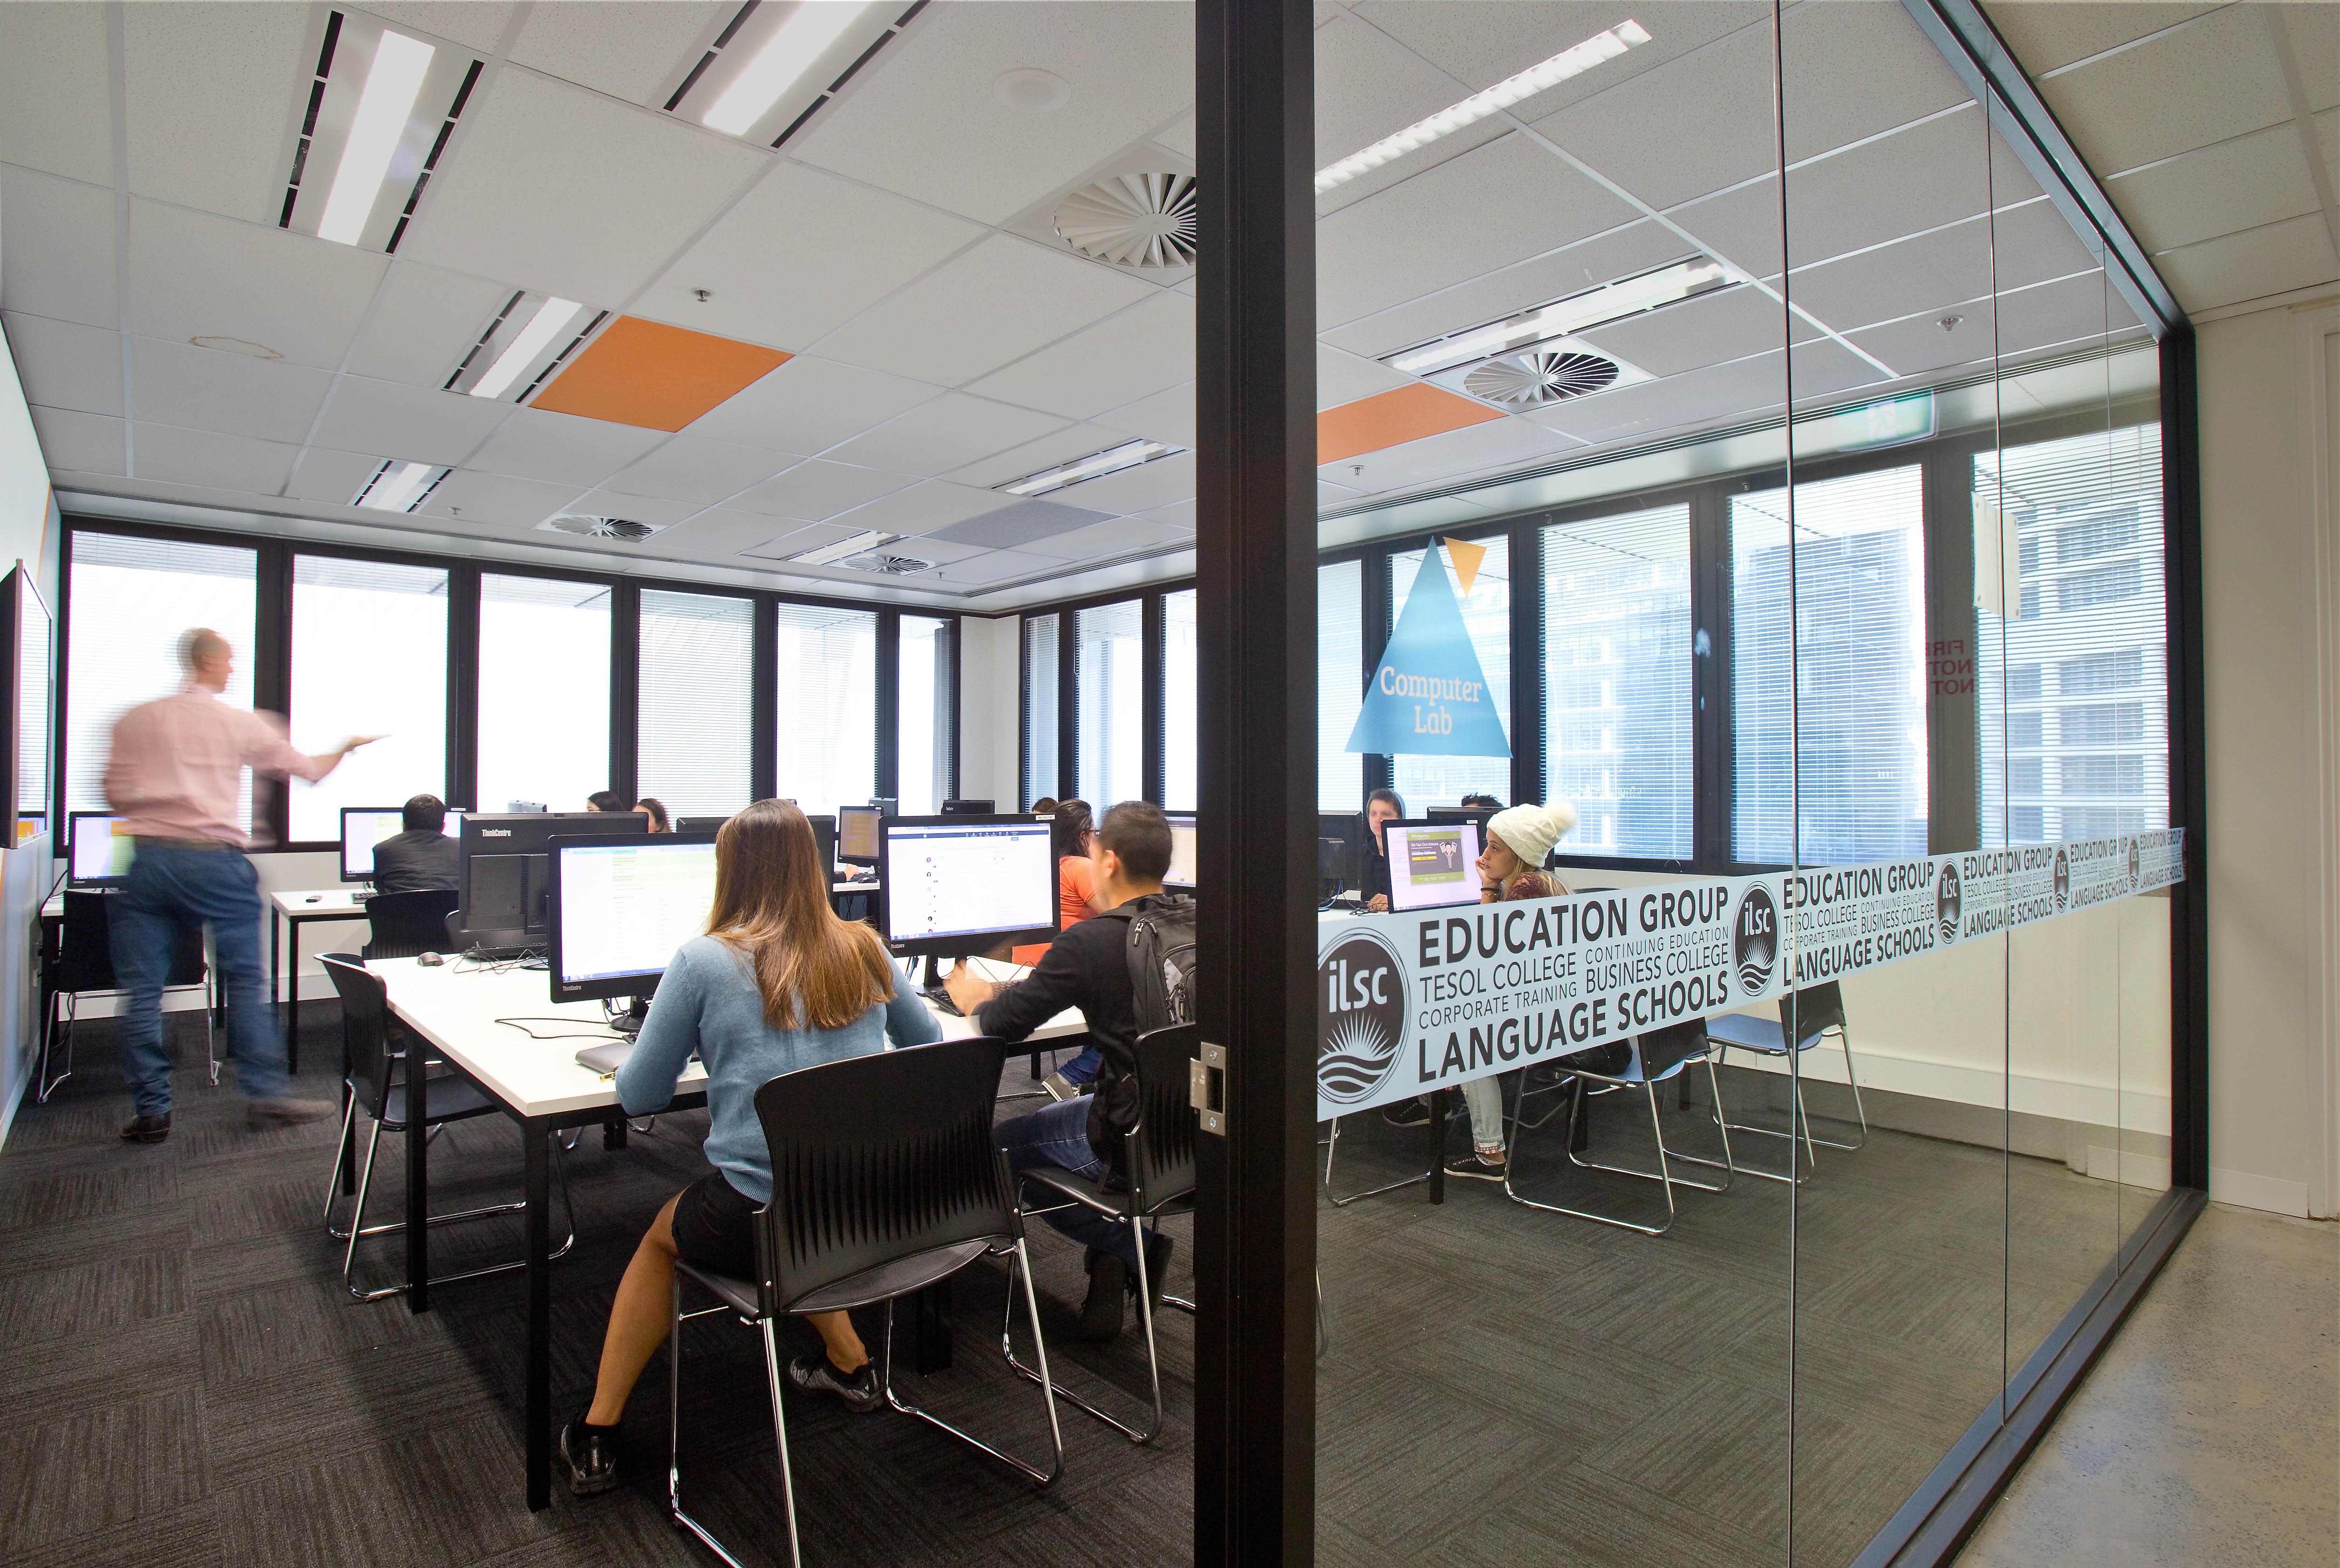 ilsc-sydney-campus-computer-lab-2